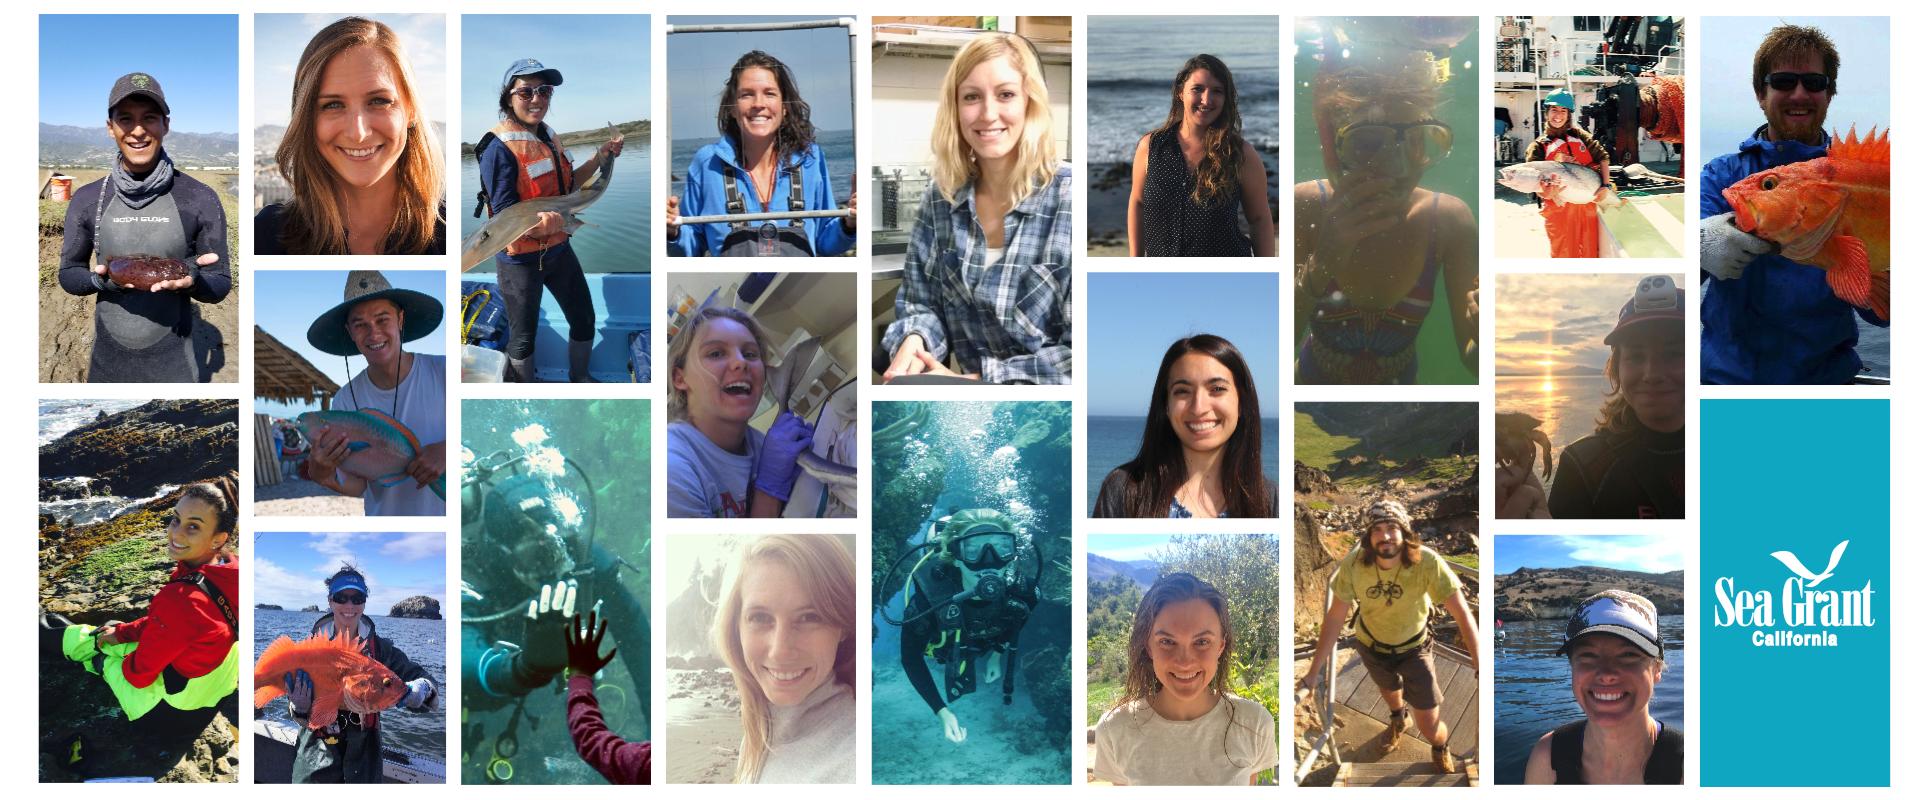 2018 California Sea Grant State Fellows